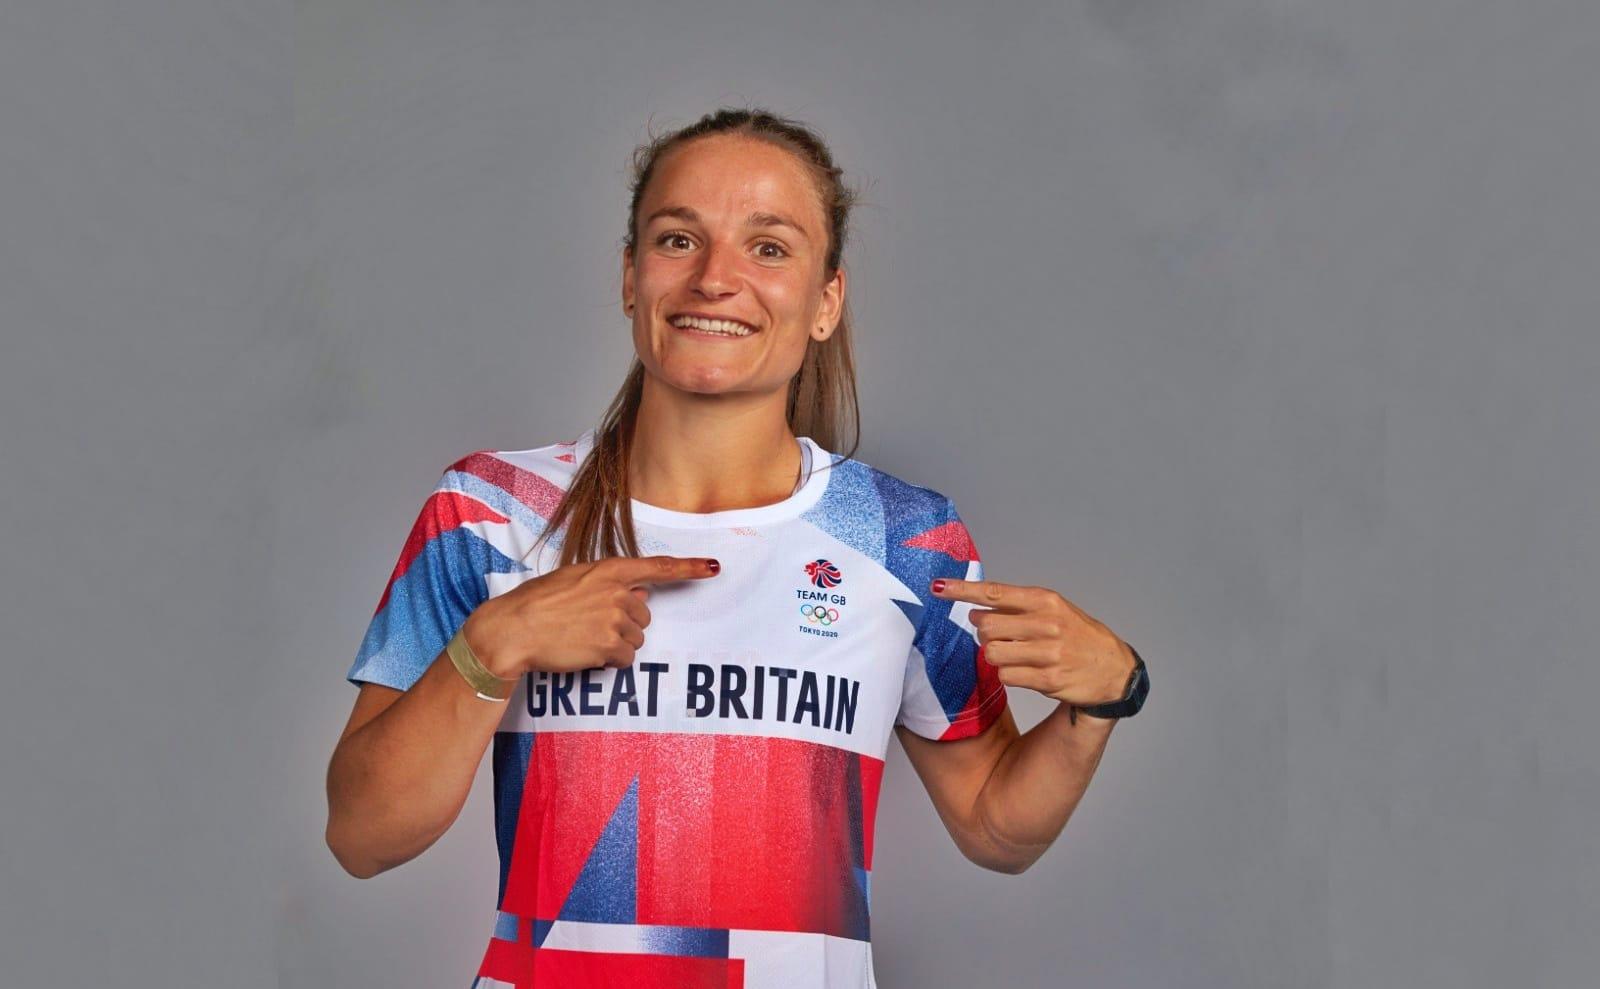 Joyce's Team GB opponents revealed